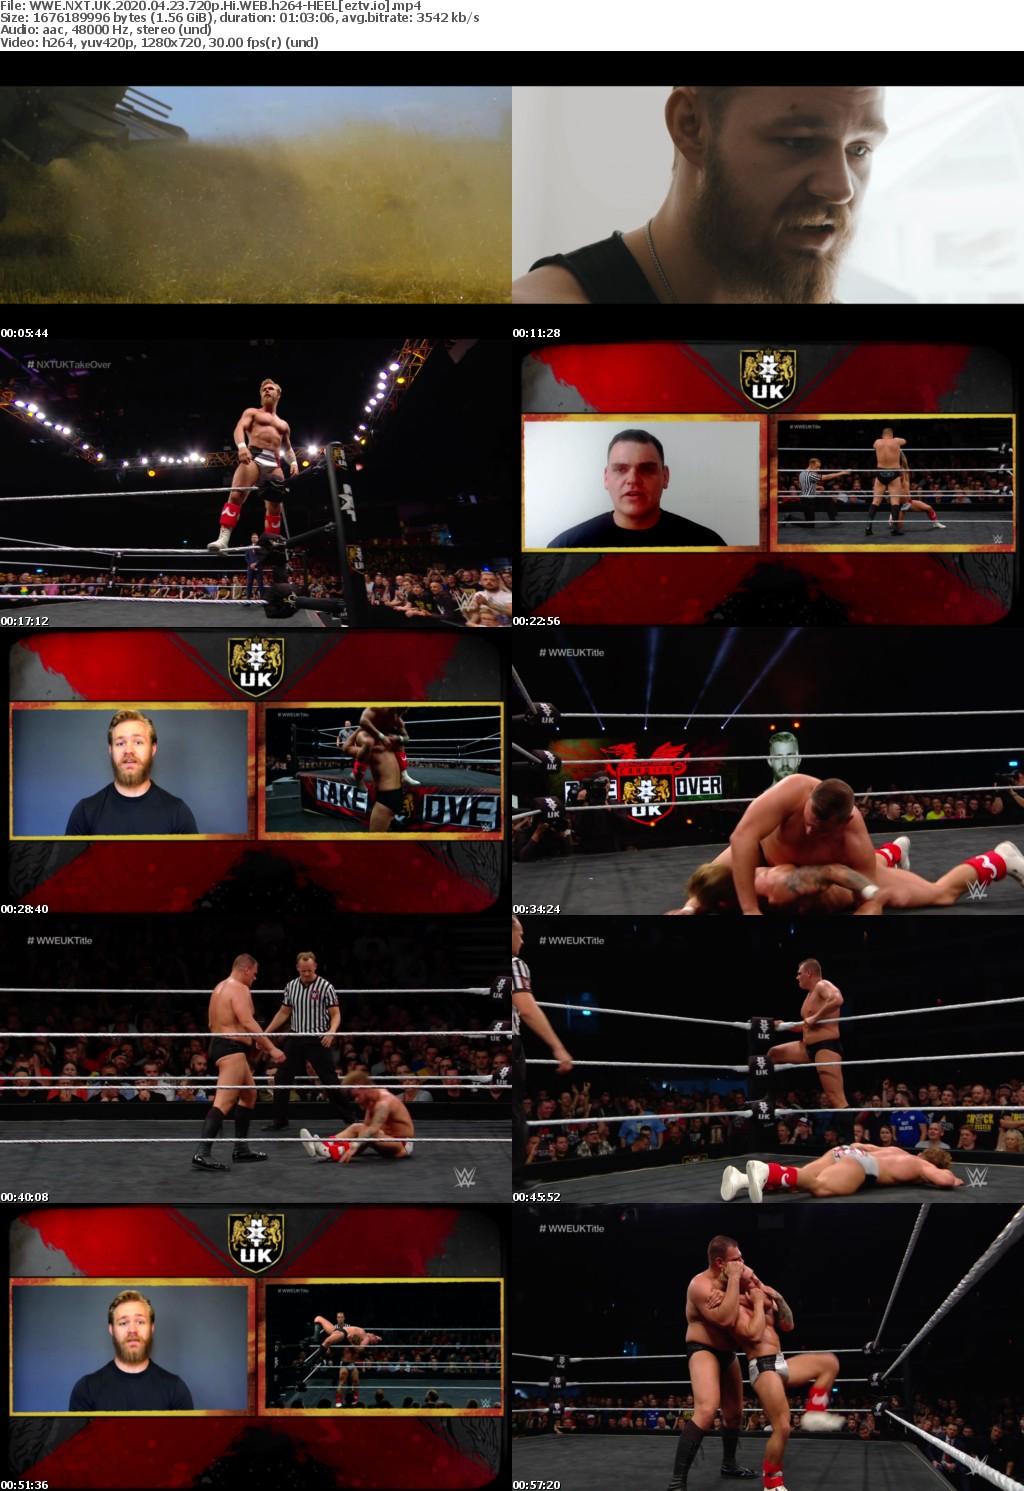 WWE NXT UK 2020 04 23 720p Hi WEB h264-HEEL